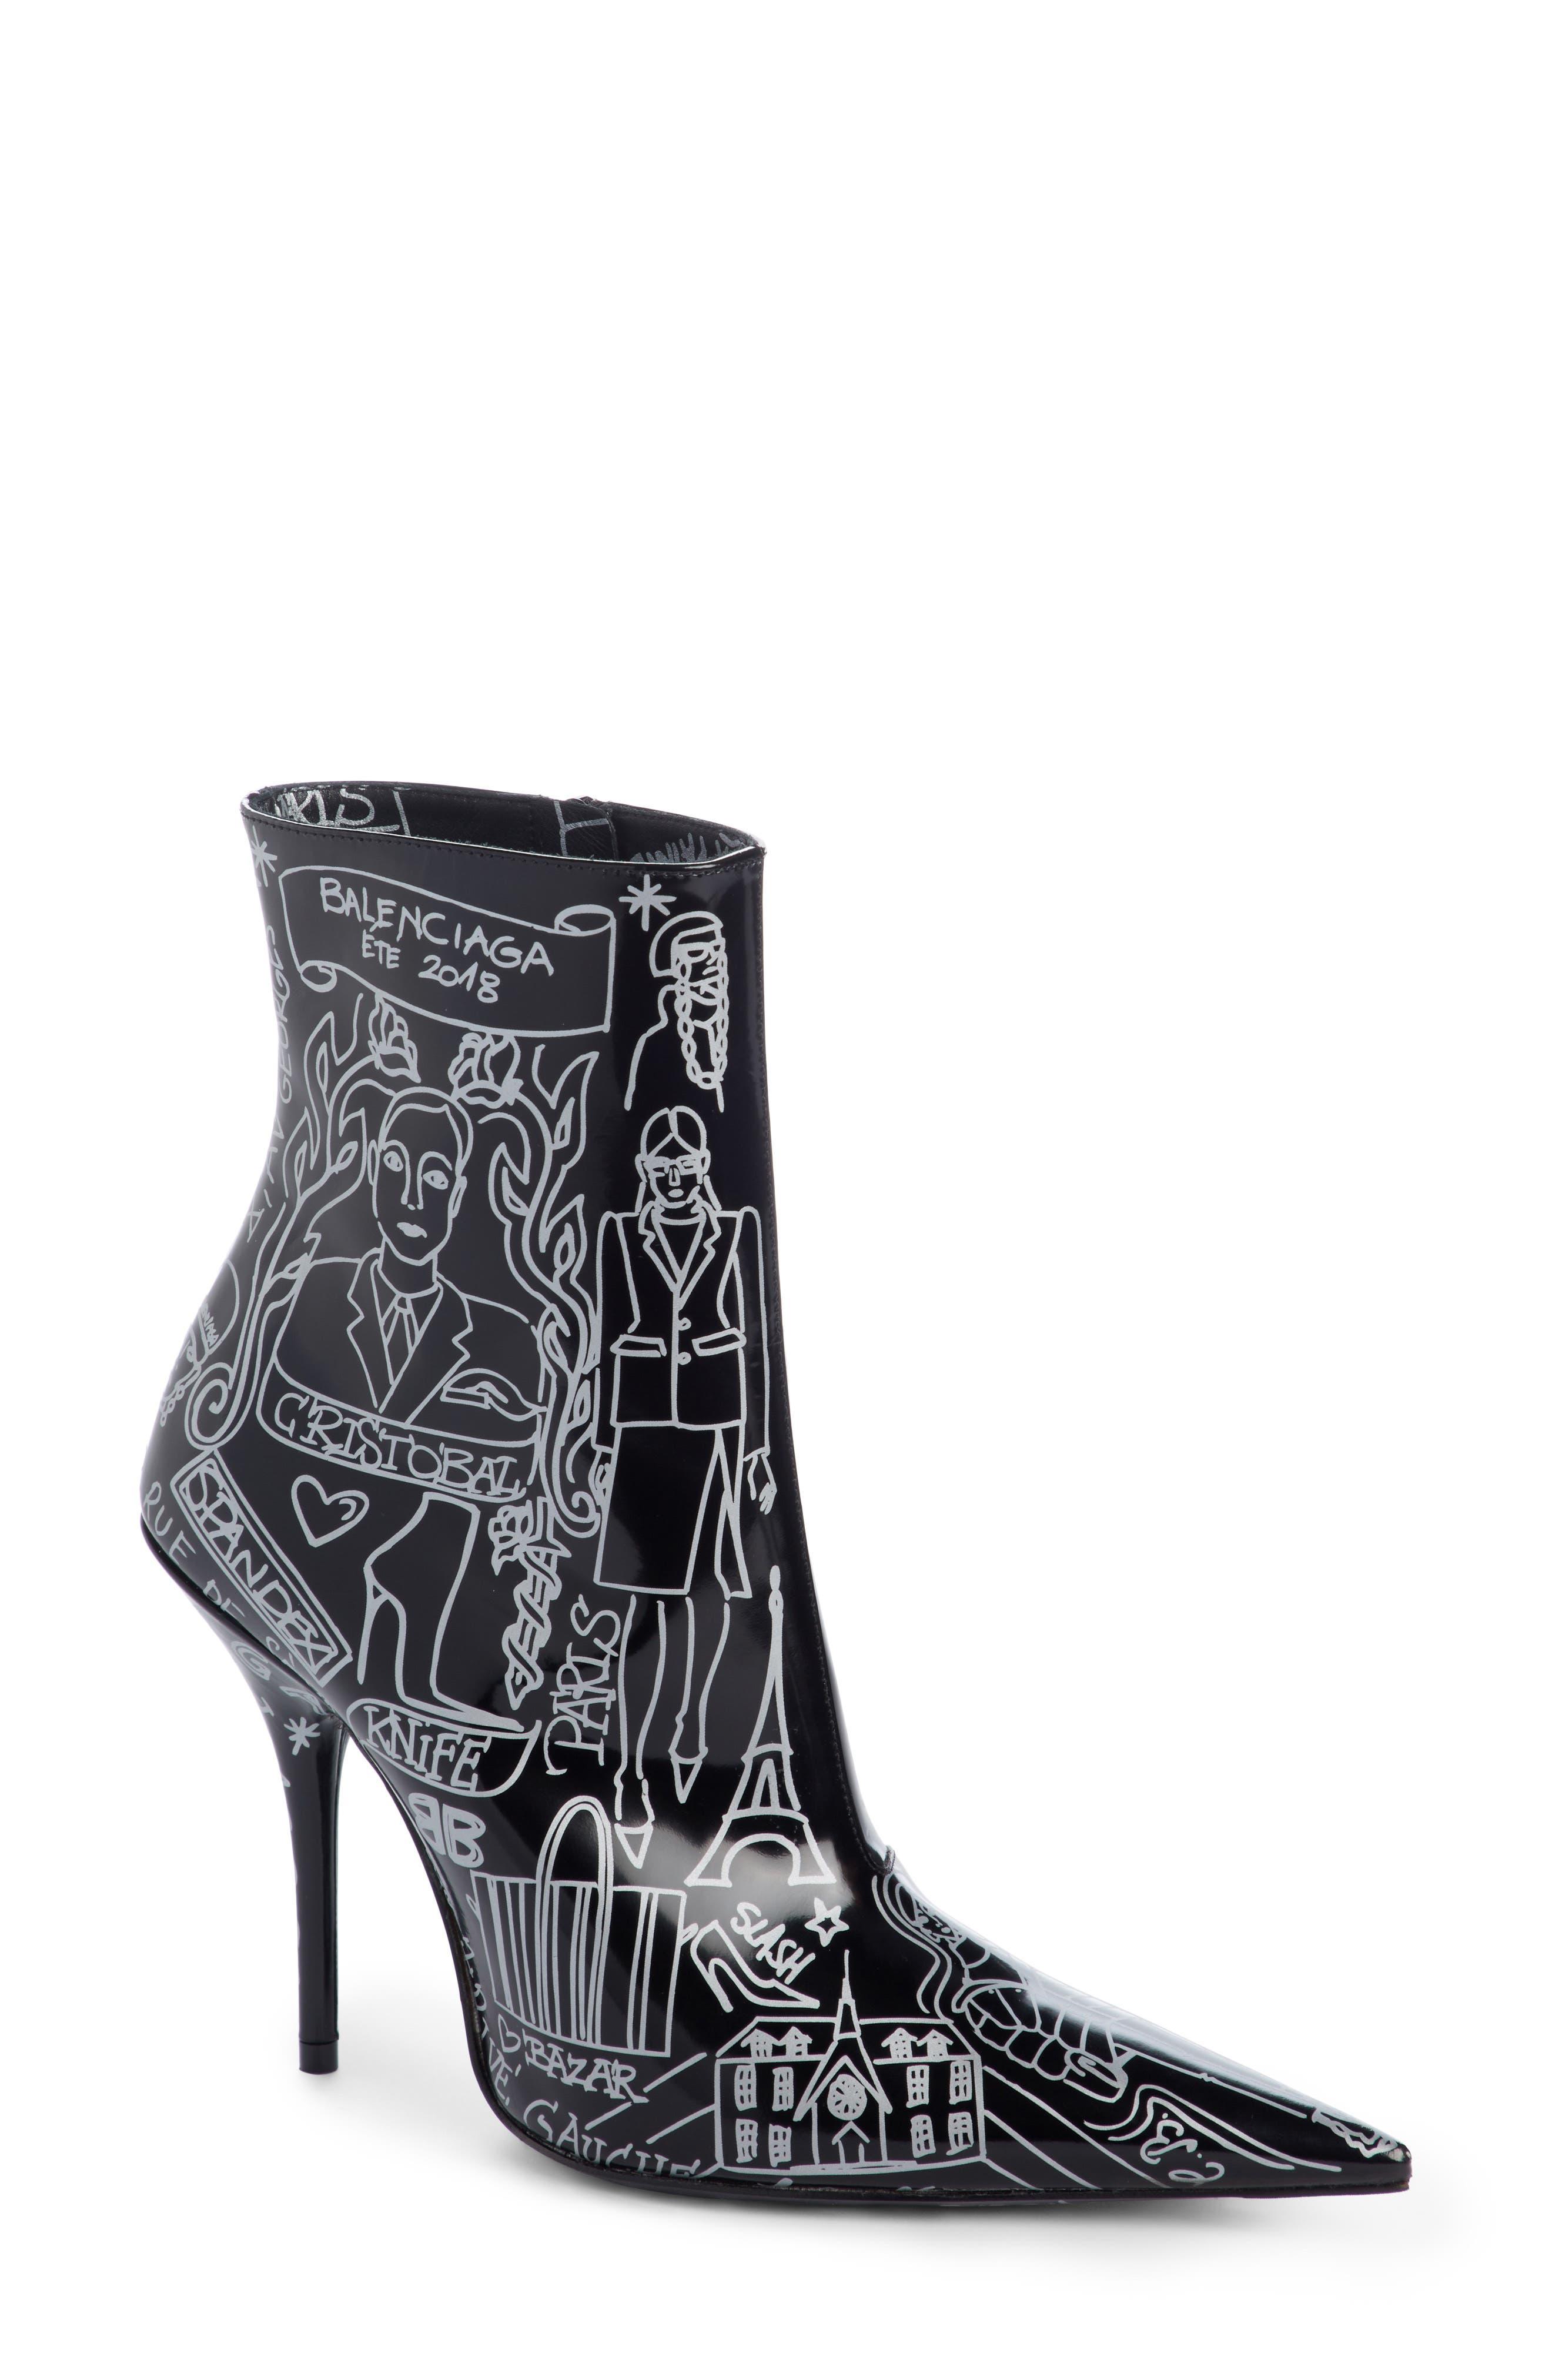 Main Image - Balenciaga Print Pointy Toe Bootie (Women)